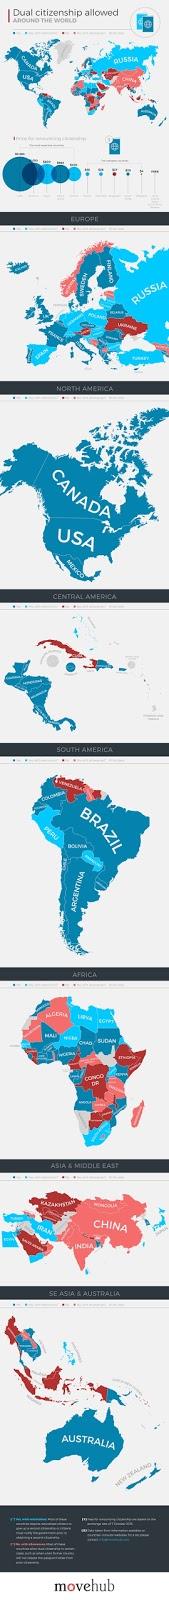 Countries that allow dual citizenship